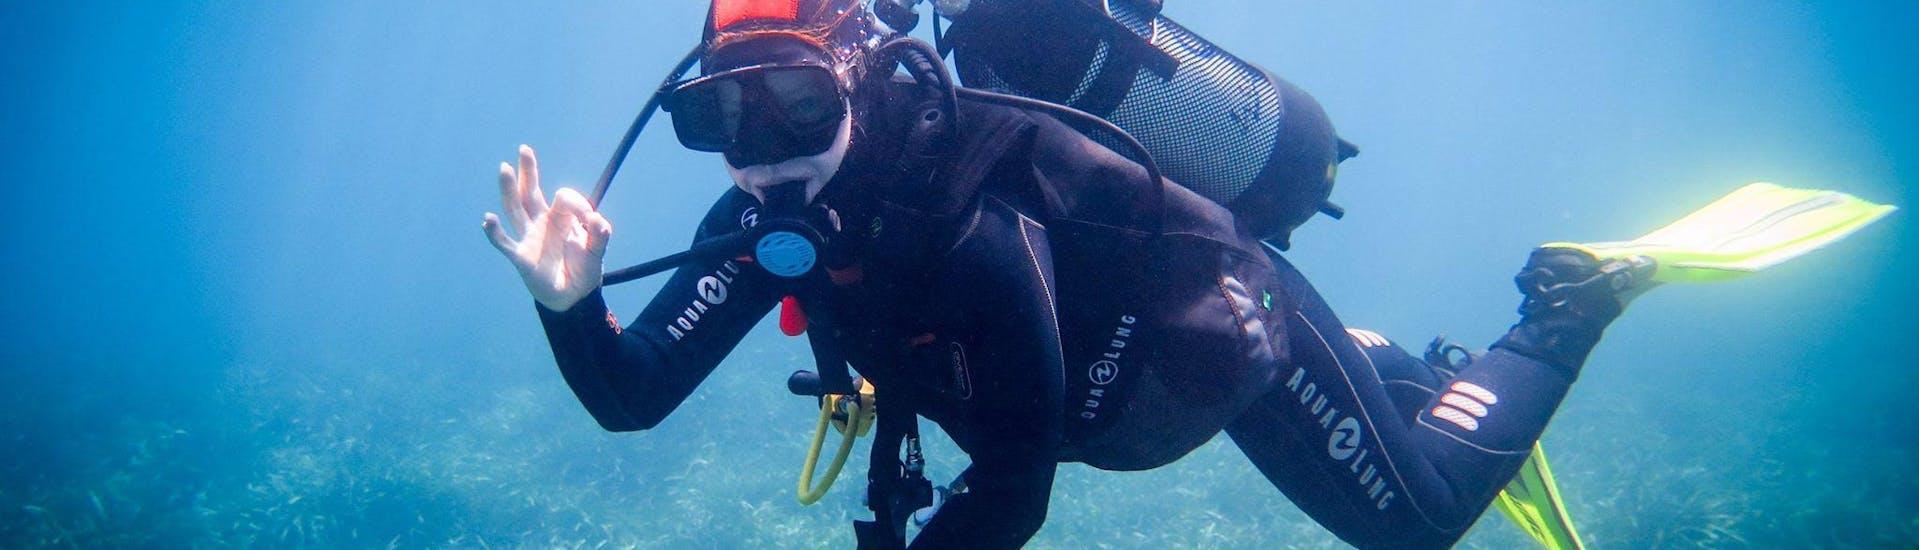 PADI Discover Scuba Diving in Qawra Bay